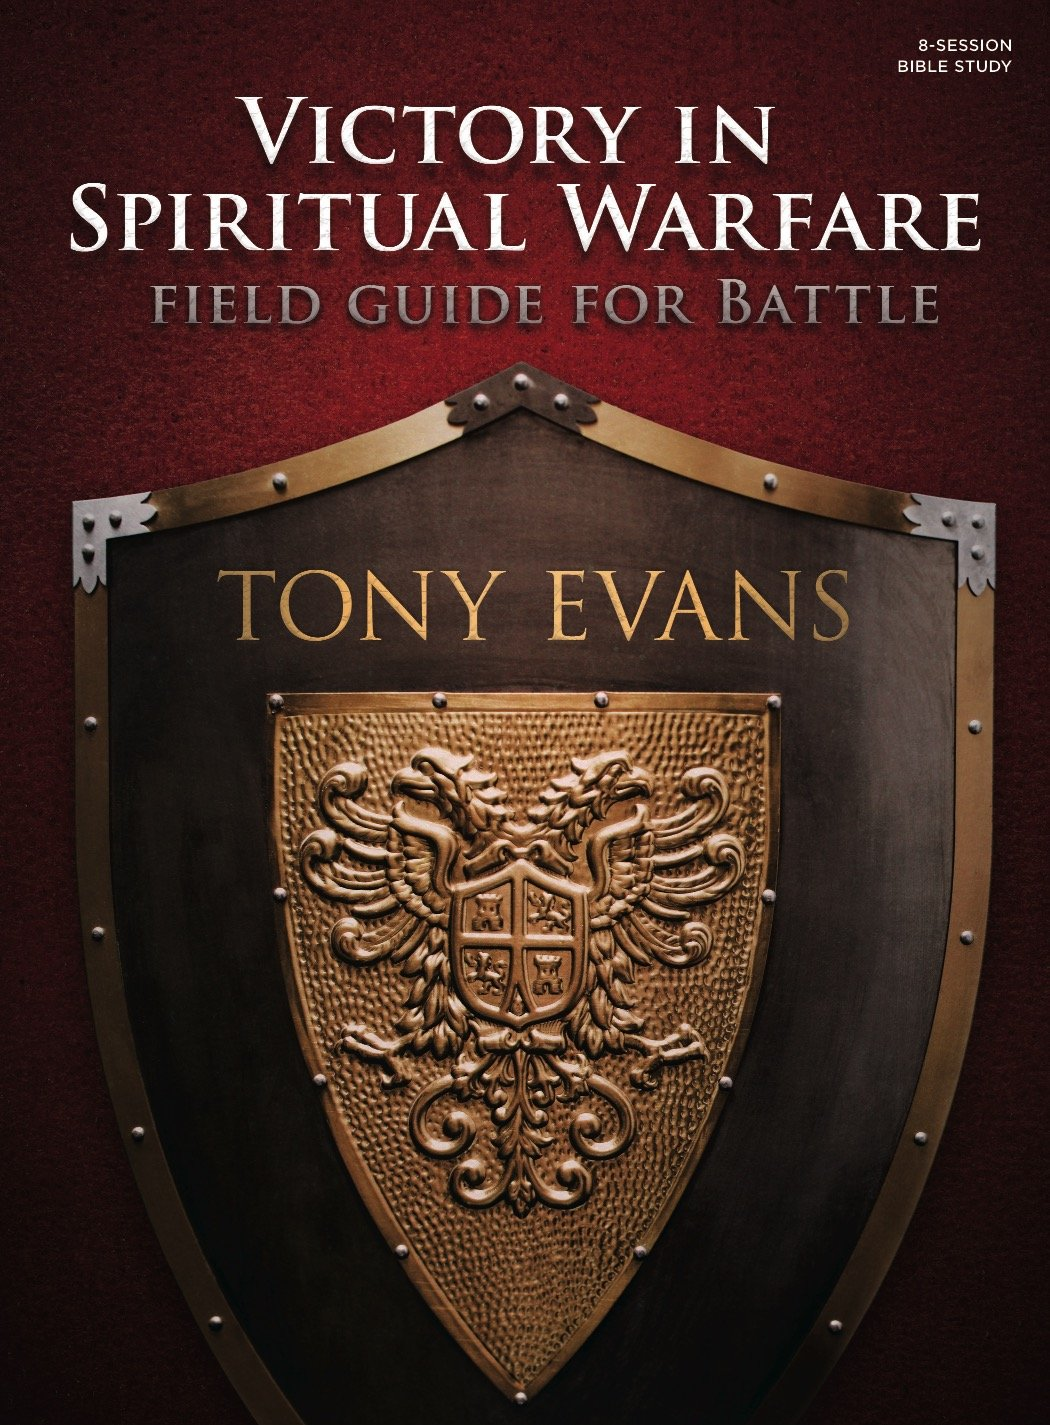 Victory in Spiritual Warfare Bible Study Book: Field Guide for ...